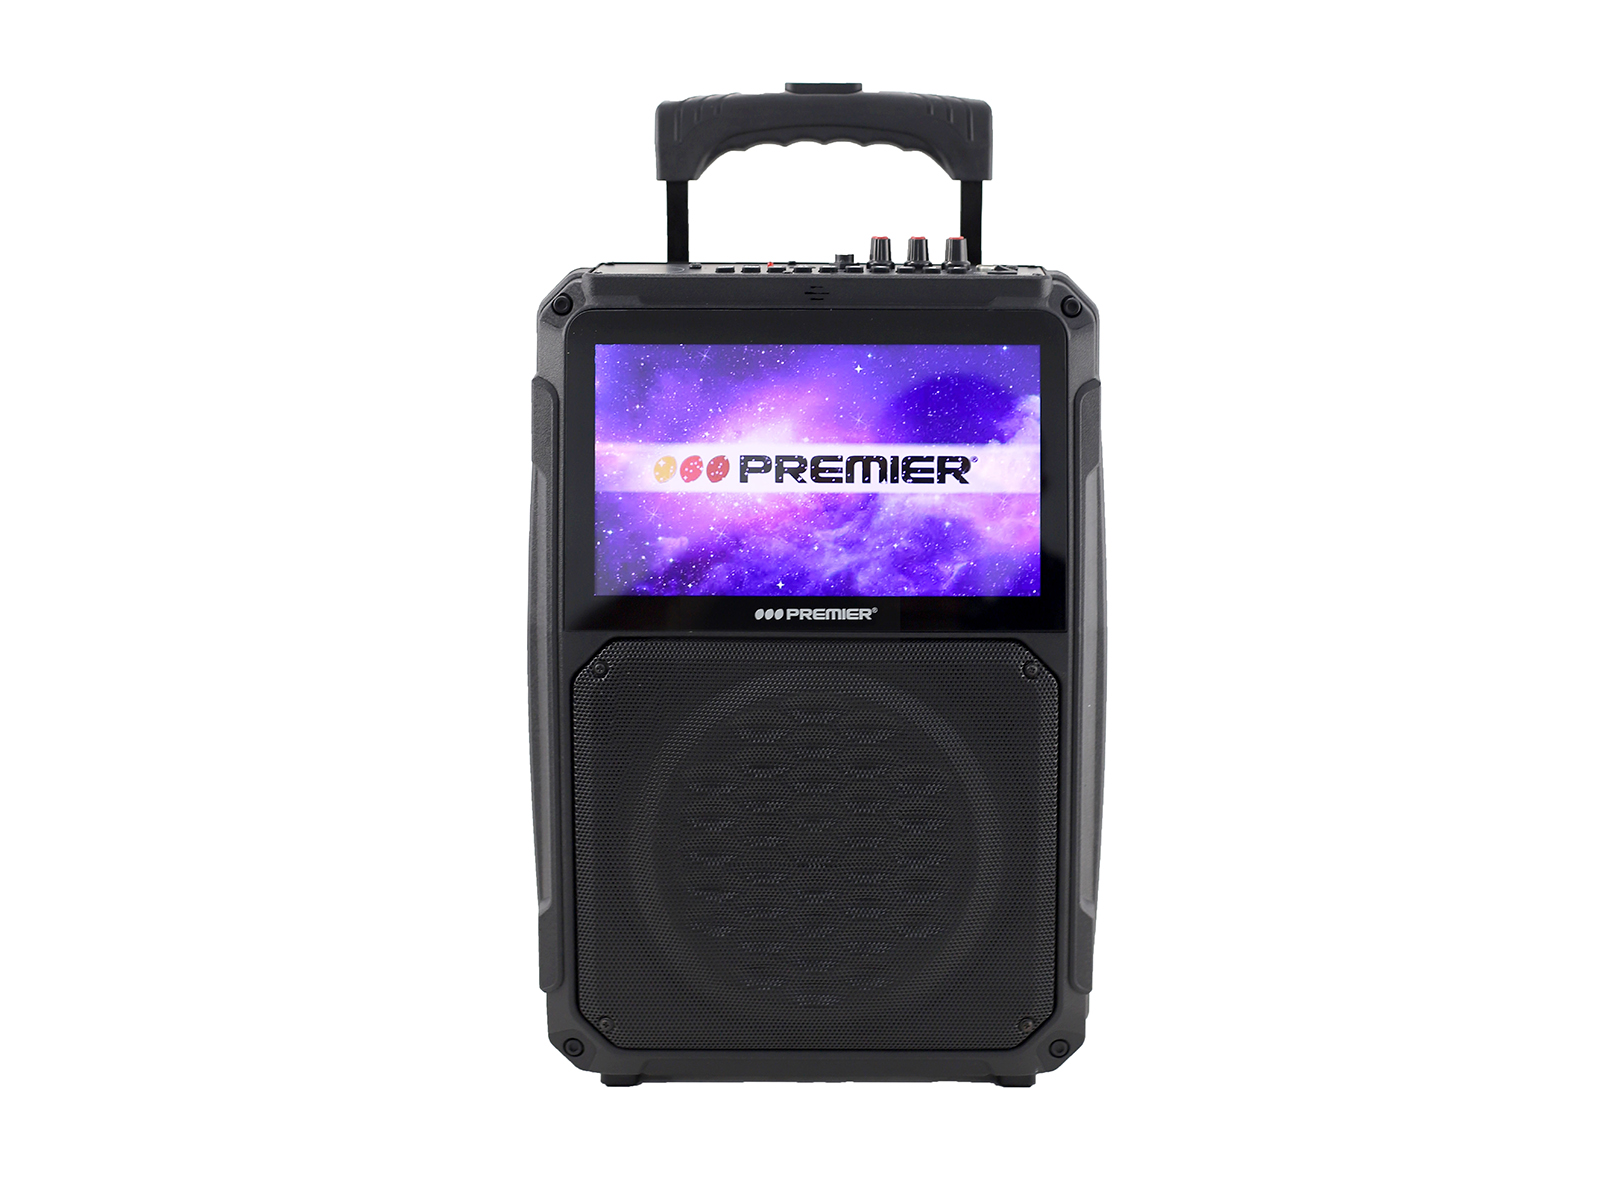 Imagen de producto Sistema portátil de karaoke con dvbt2 4